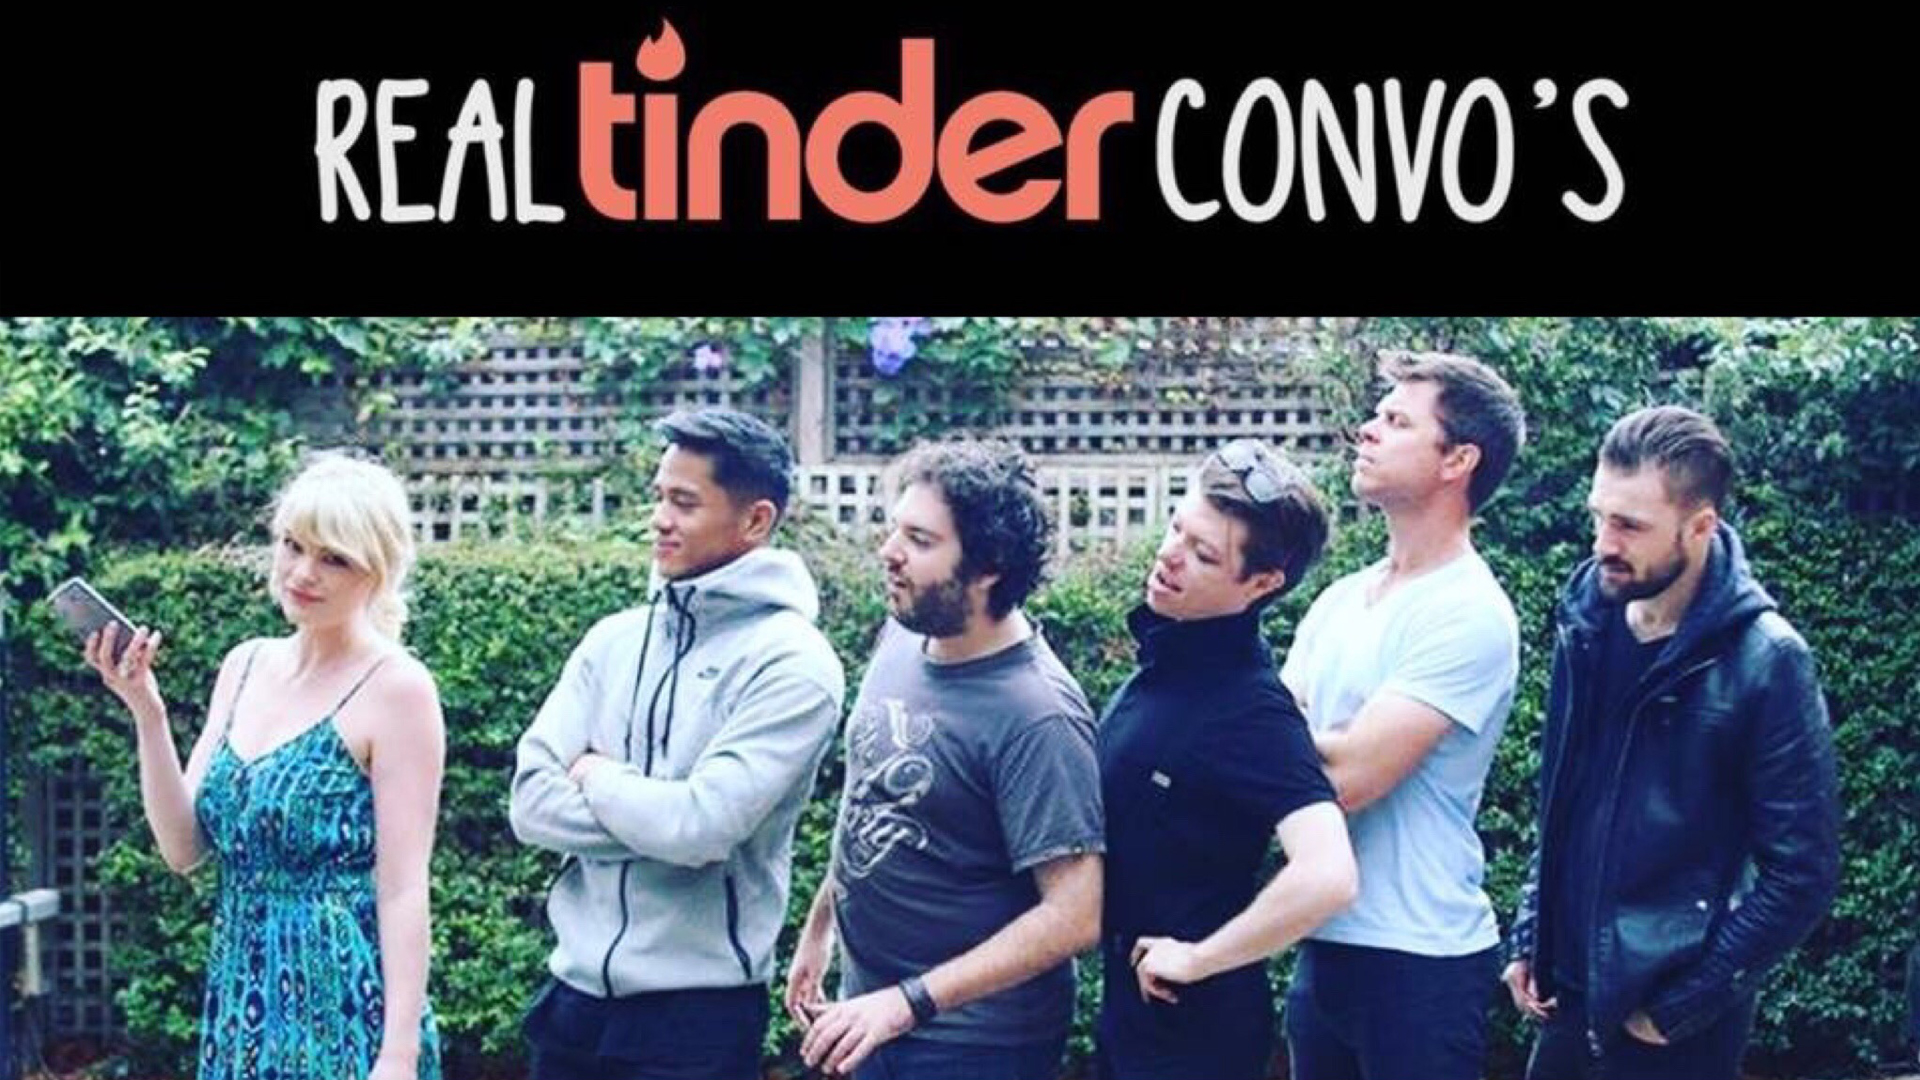 Real Tinder Convos